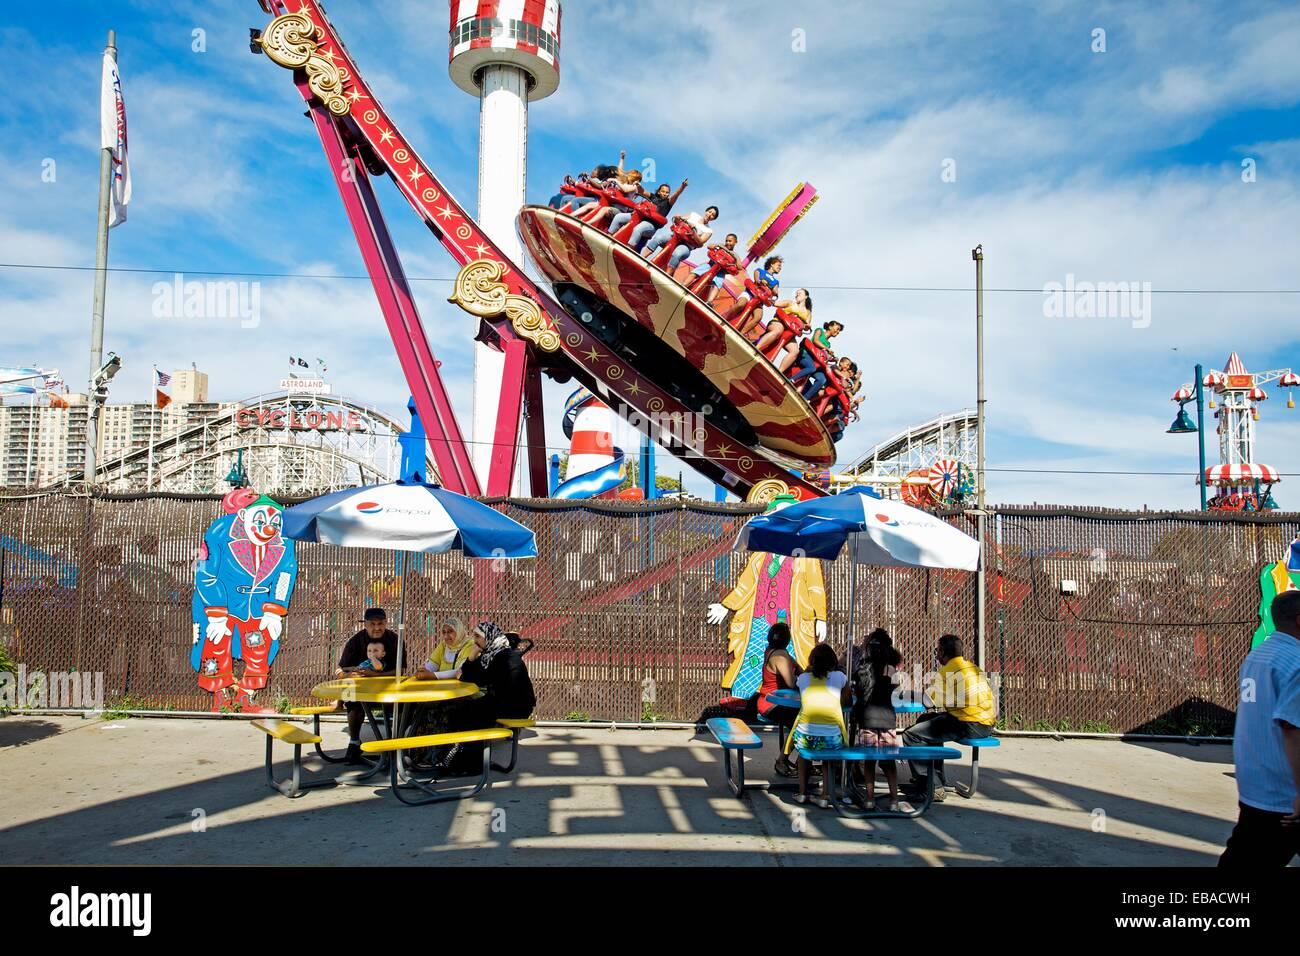 Acuario Coney Island New York